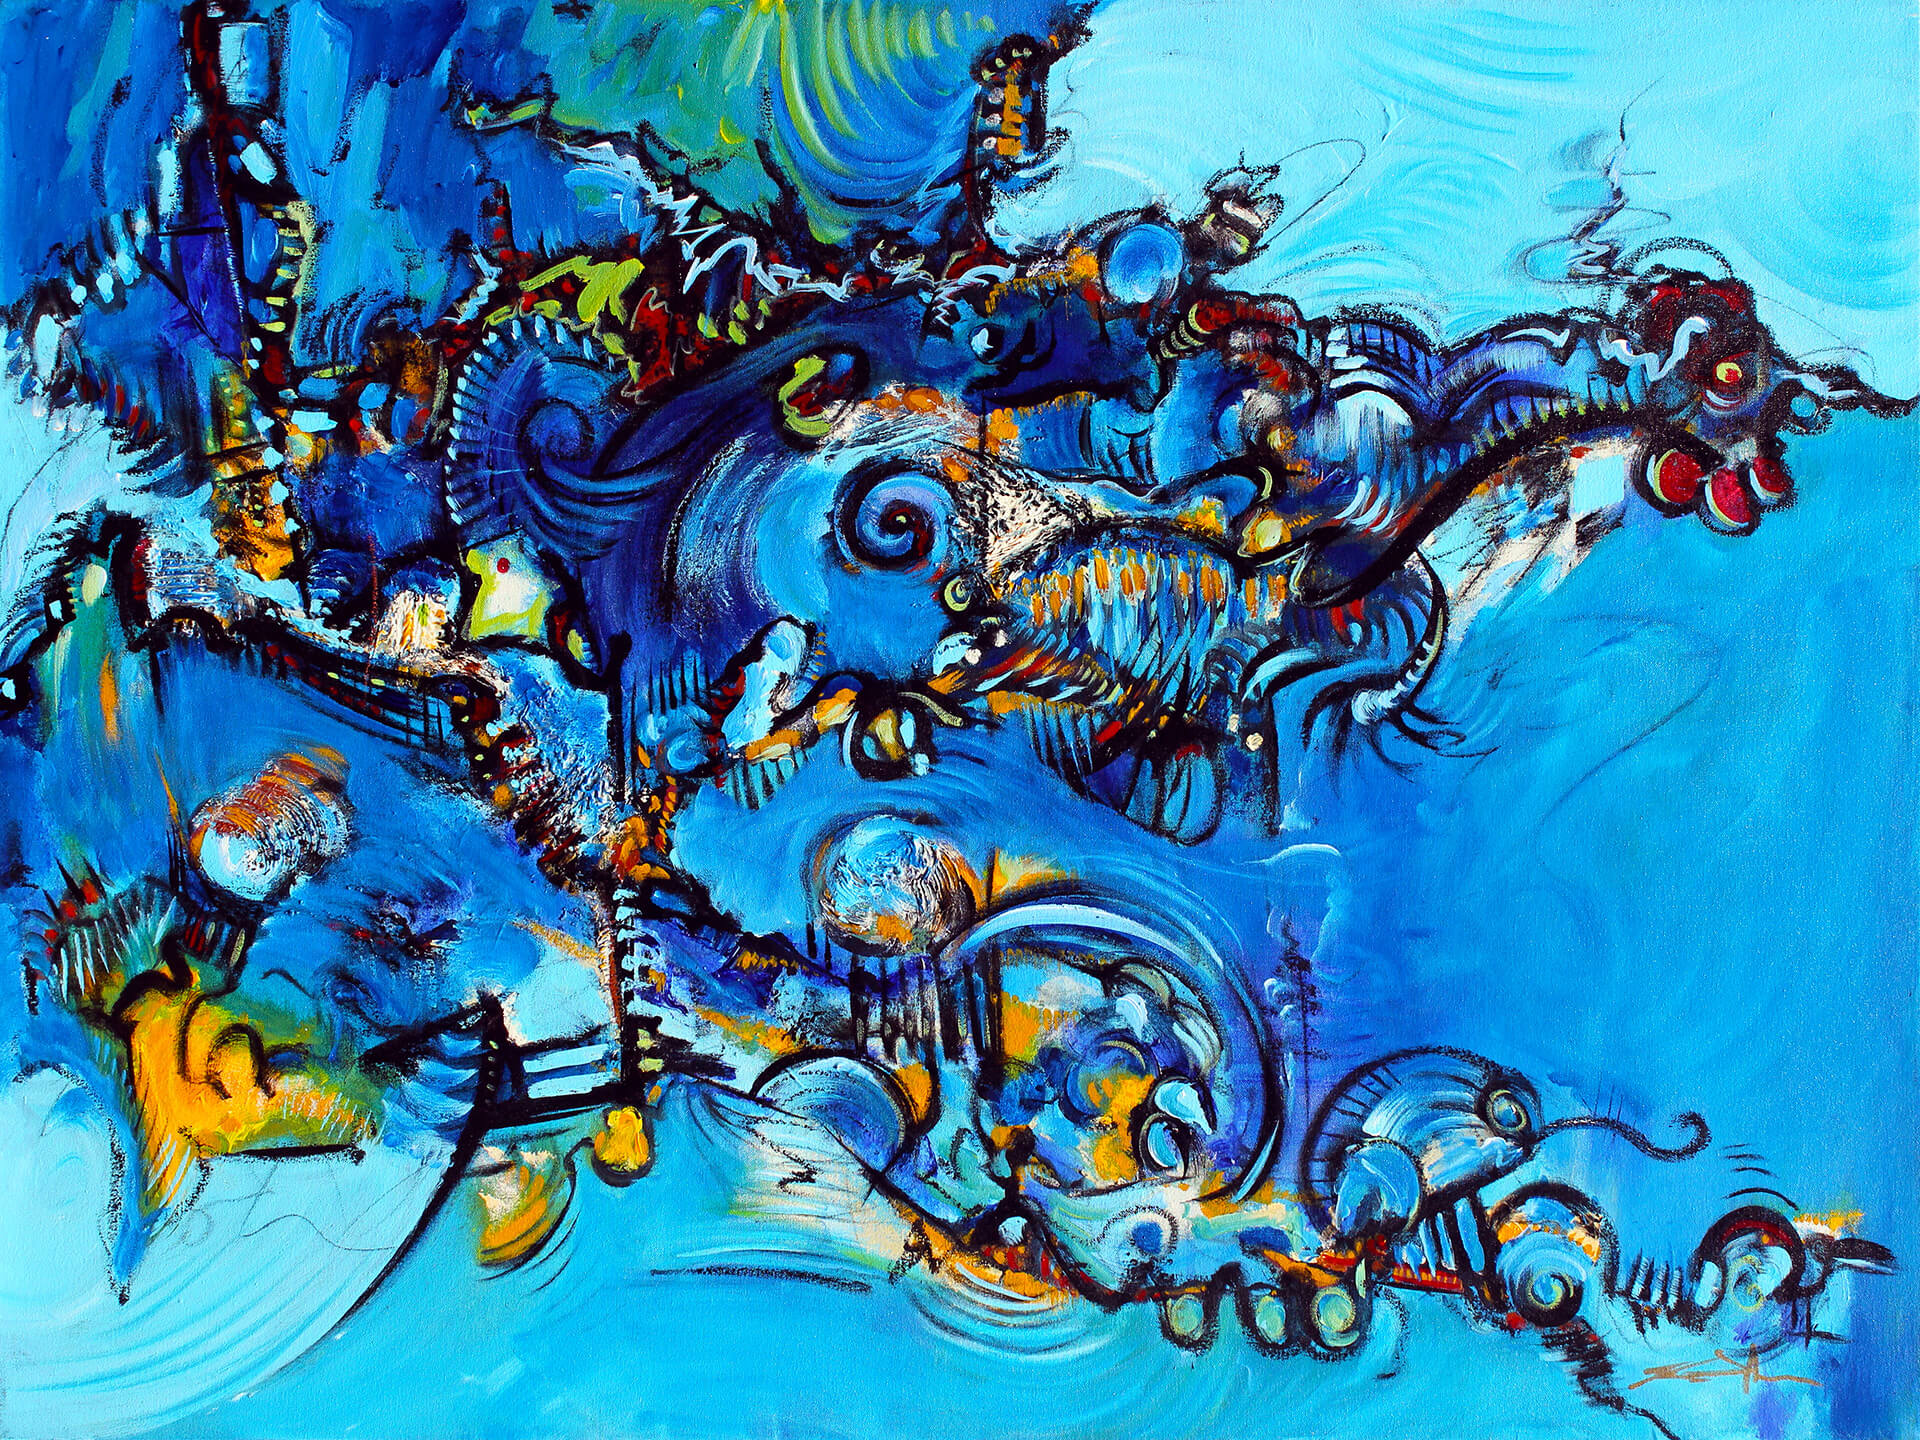 art-eric-j-hughes-artiste-peintre-canadien-tableau-delirium-coqameleonerie